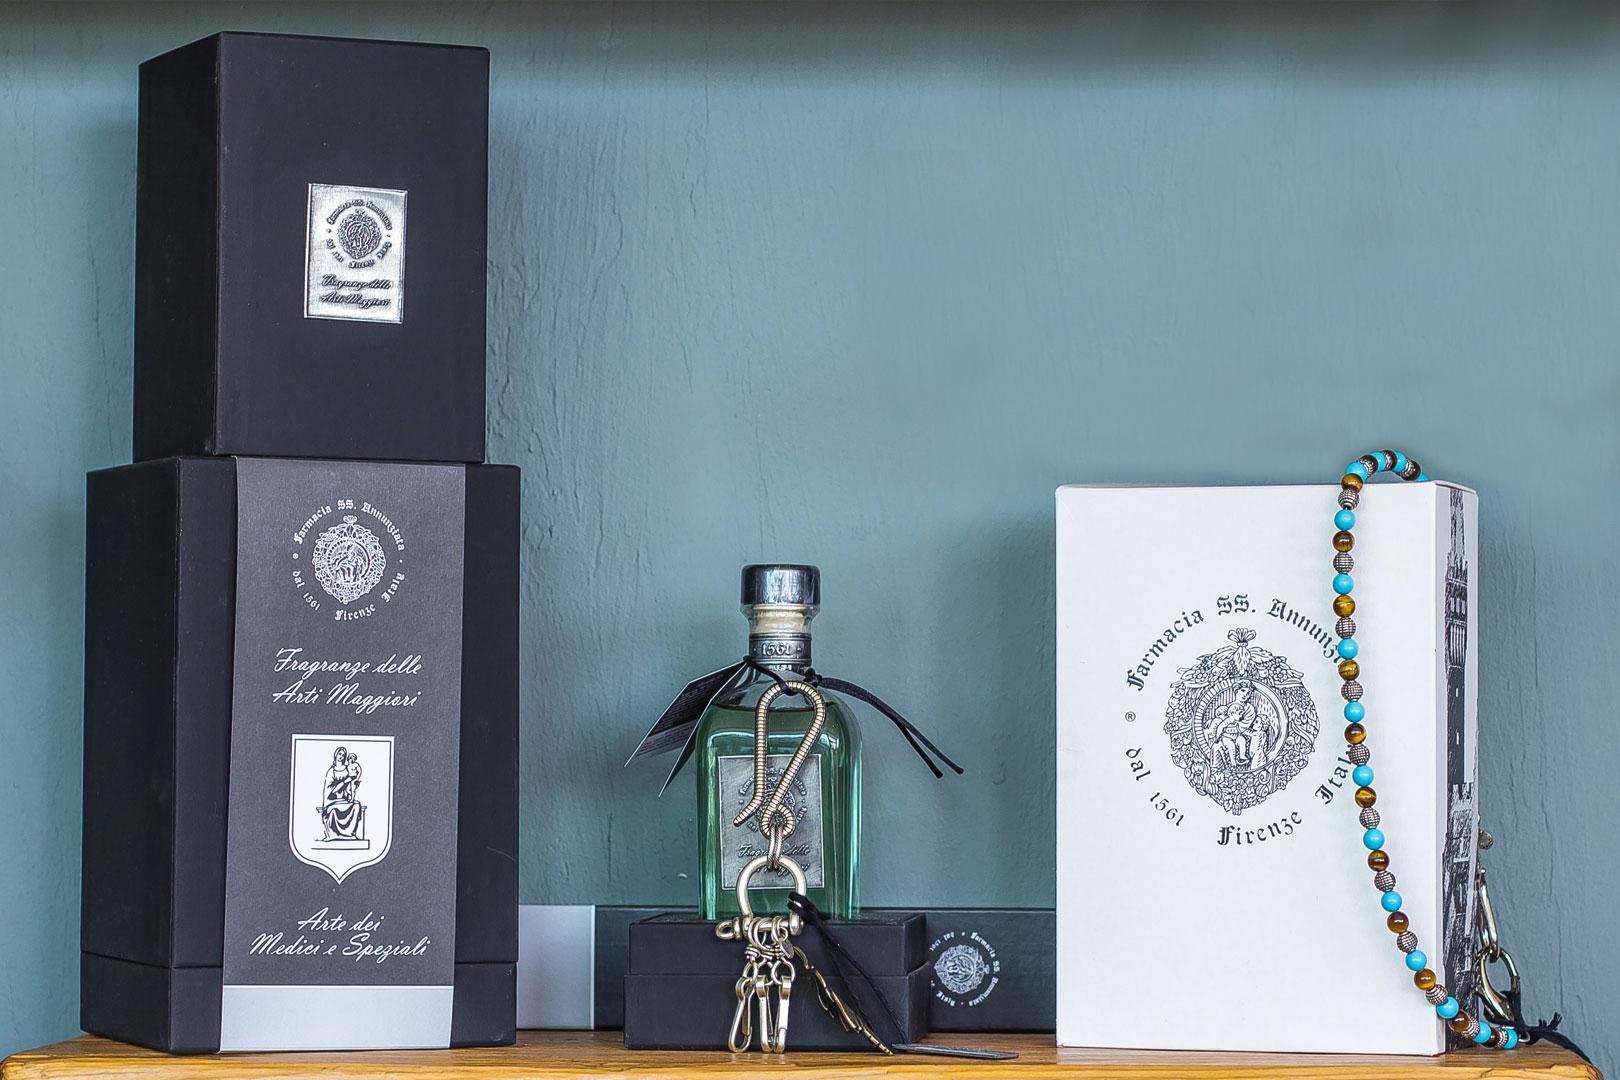 16b Avvenice - Farmacia SS- Annunziata - Firenze - Florence - Made in Italy - New Cosmetics - Arte di Medici e Speziali.jpg